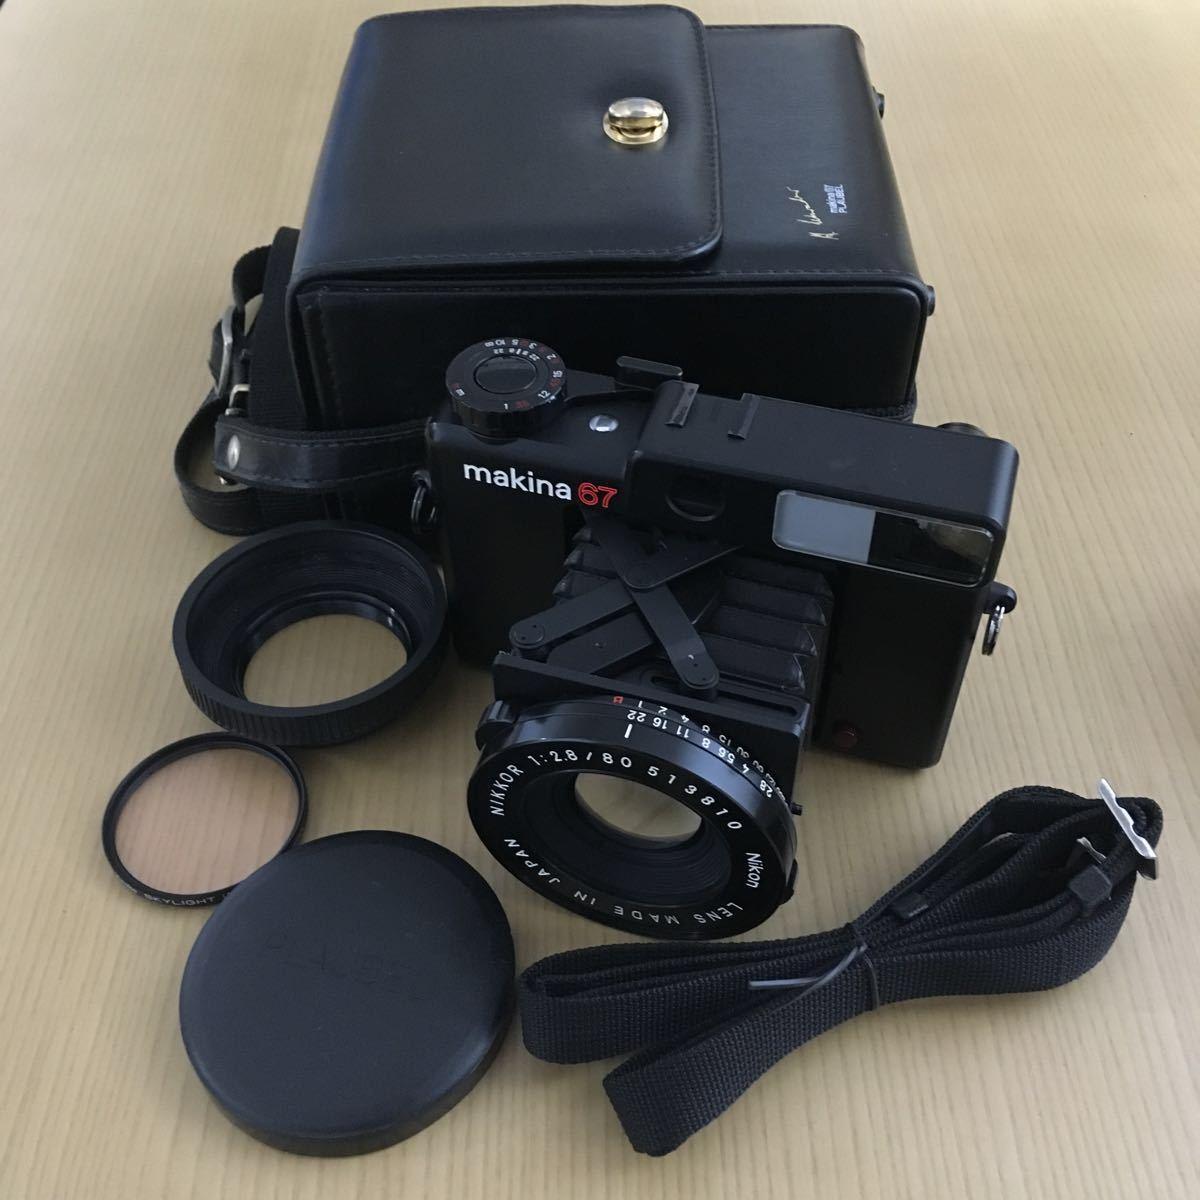 PLAUBEL makina 67 (Nikon Nikkor 80mm f2.8)プラウベル・マキナ 中判カメラ 完動品 シャッター切れスピード変化し露出計も動作しました。